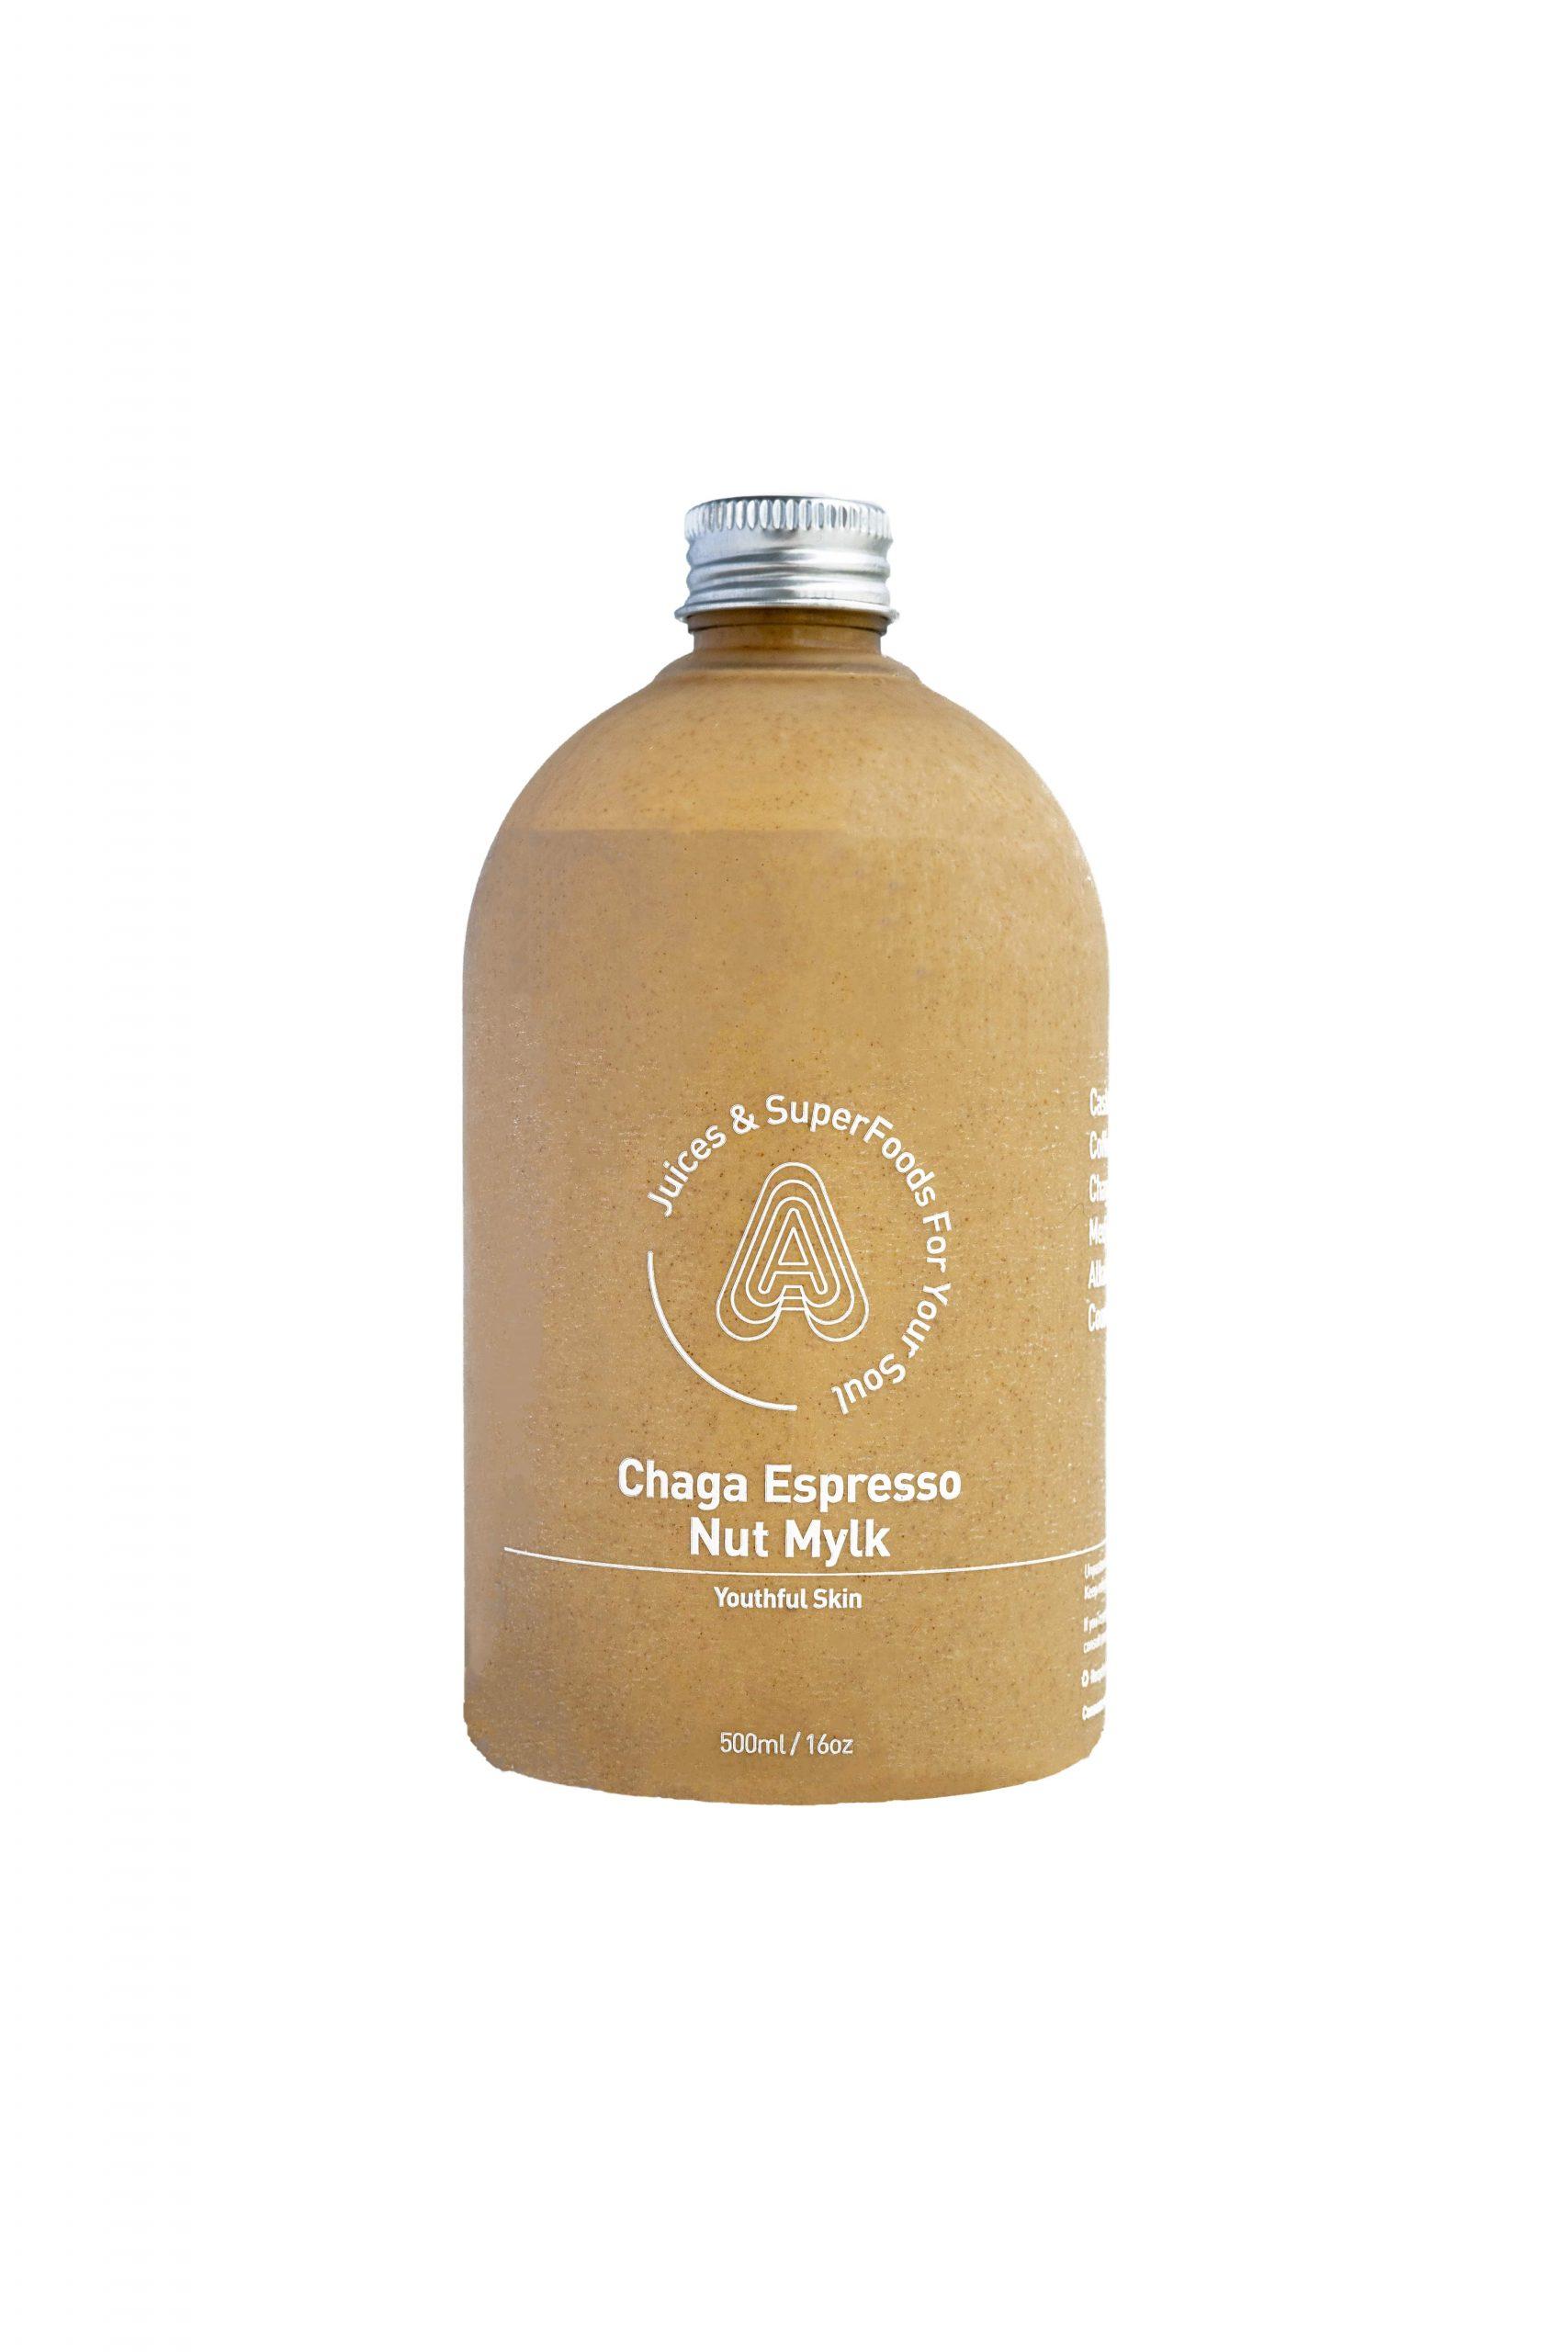 Chaga Espresso Nut Mylk